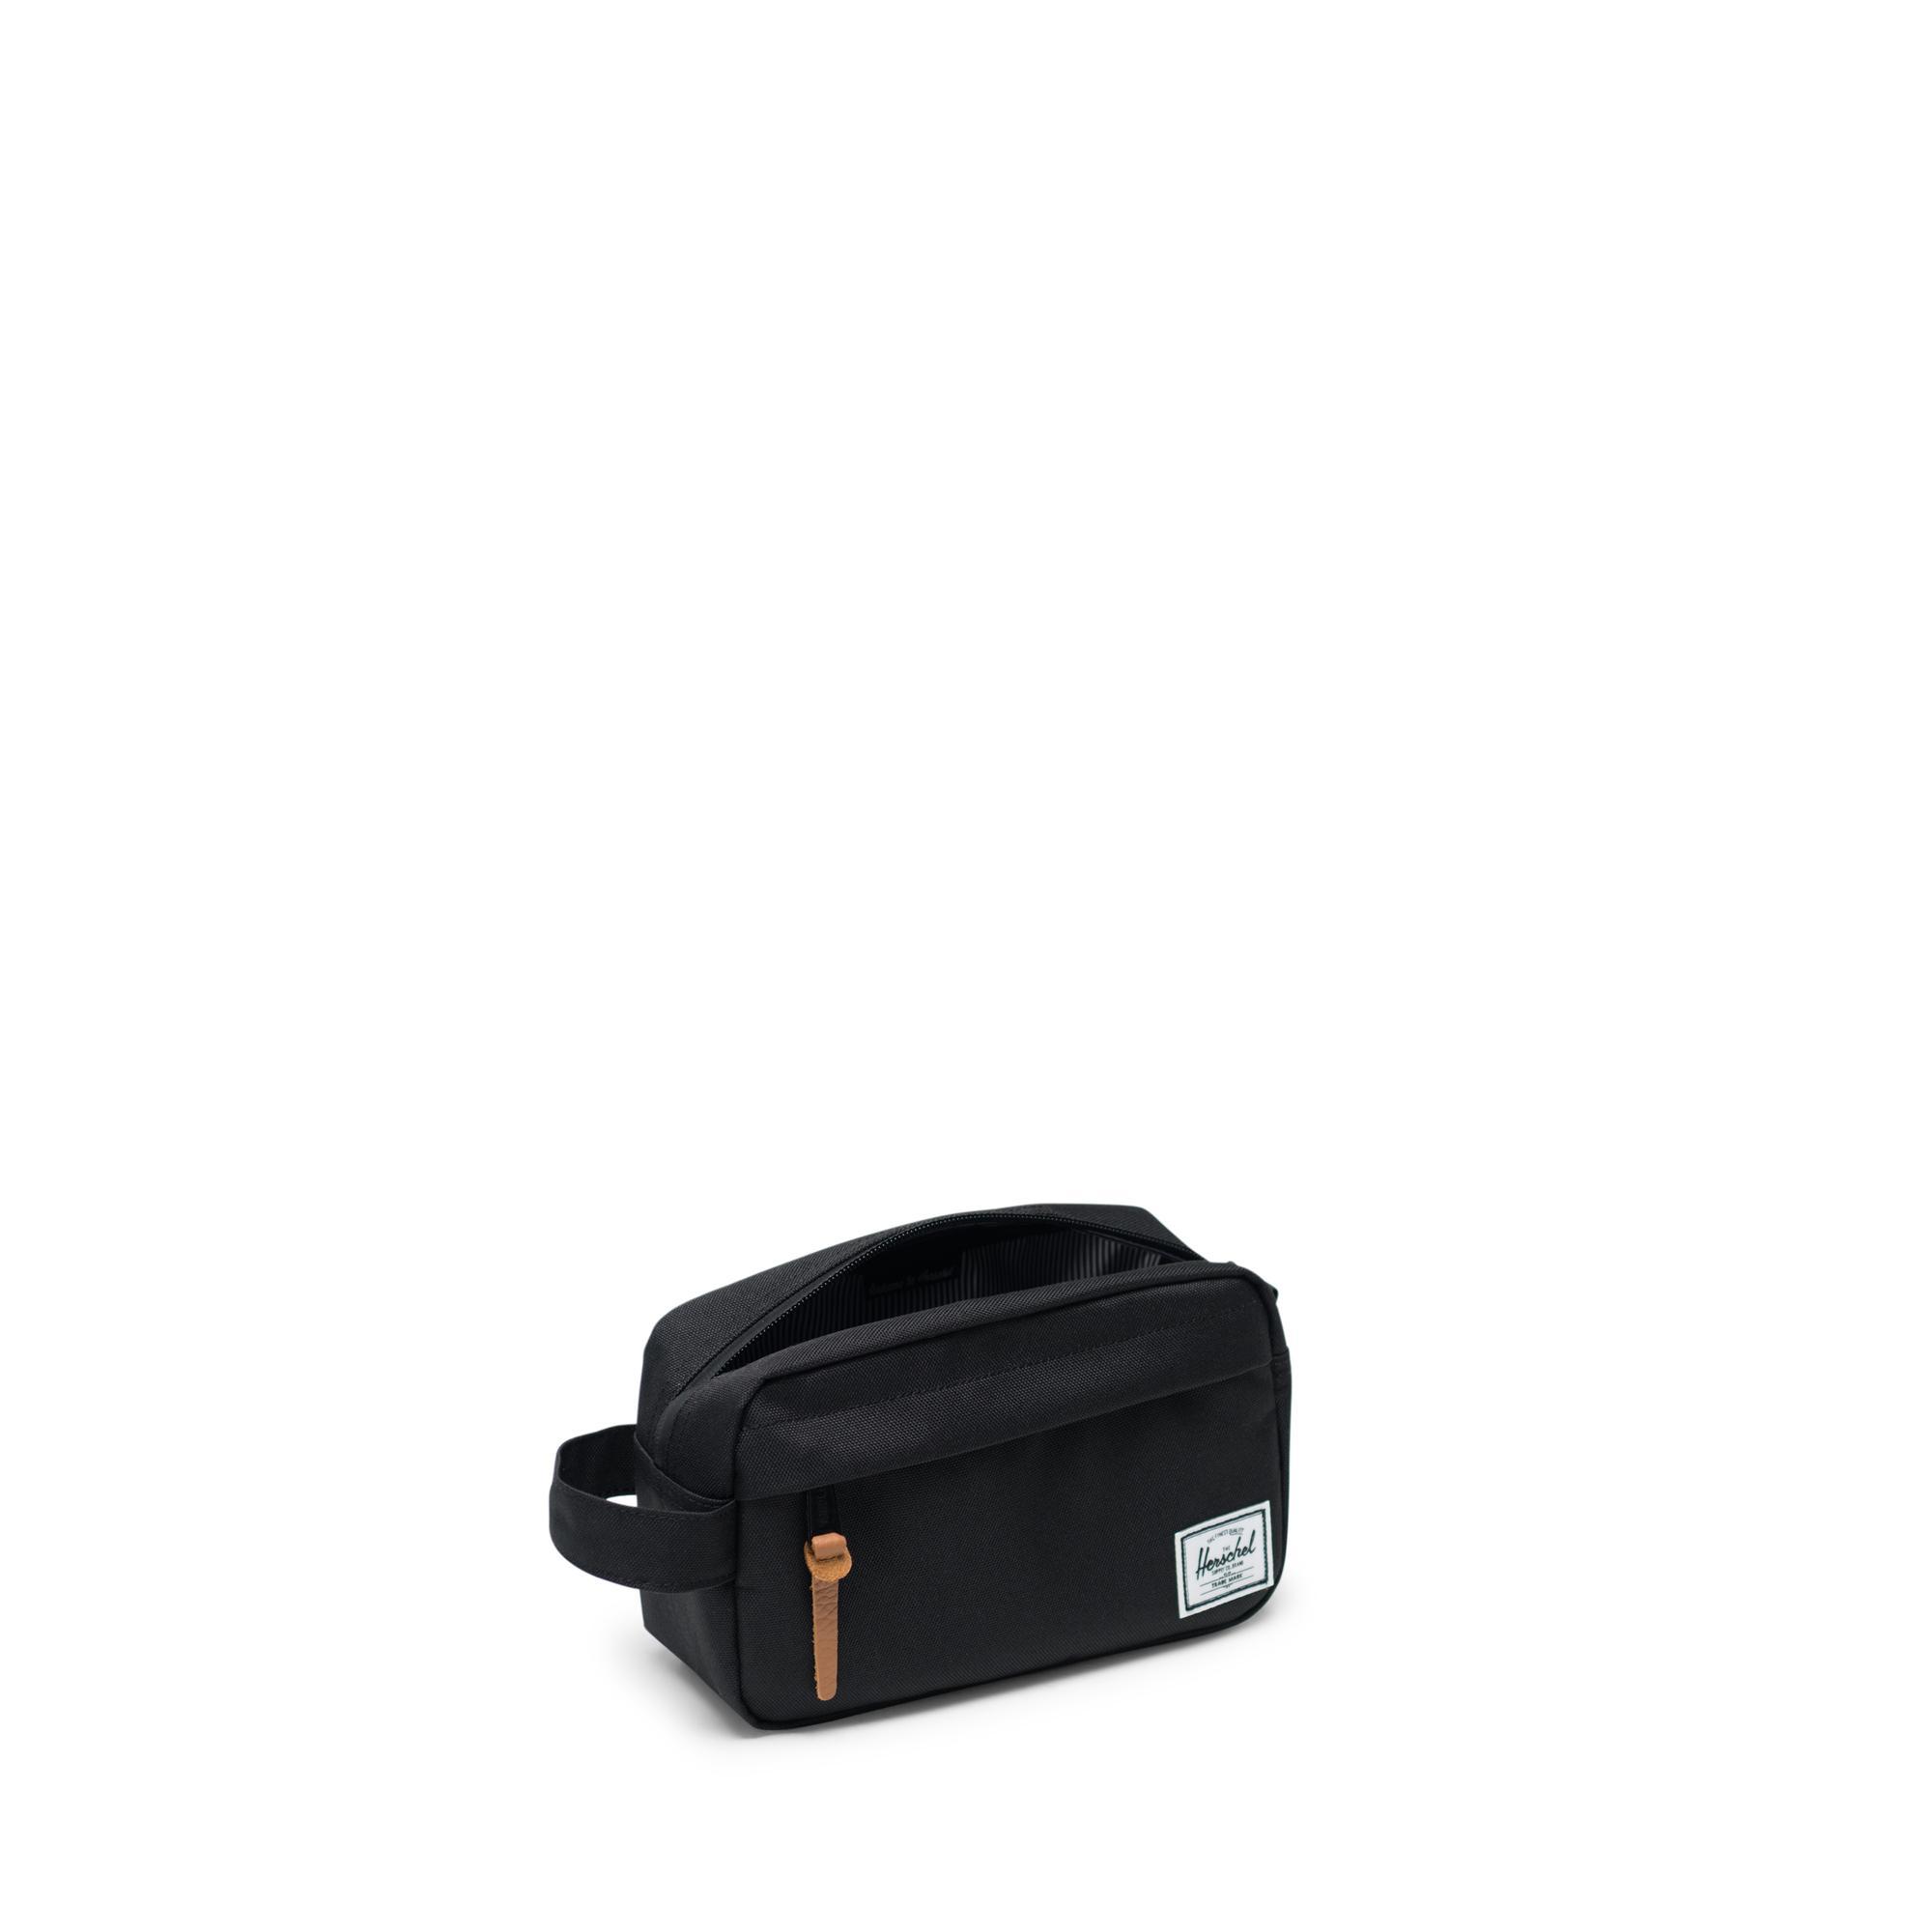 a5450270b2af Chapter Travel Kit | Carry-On